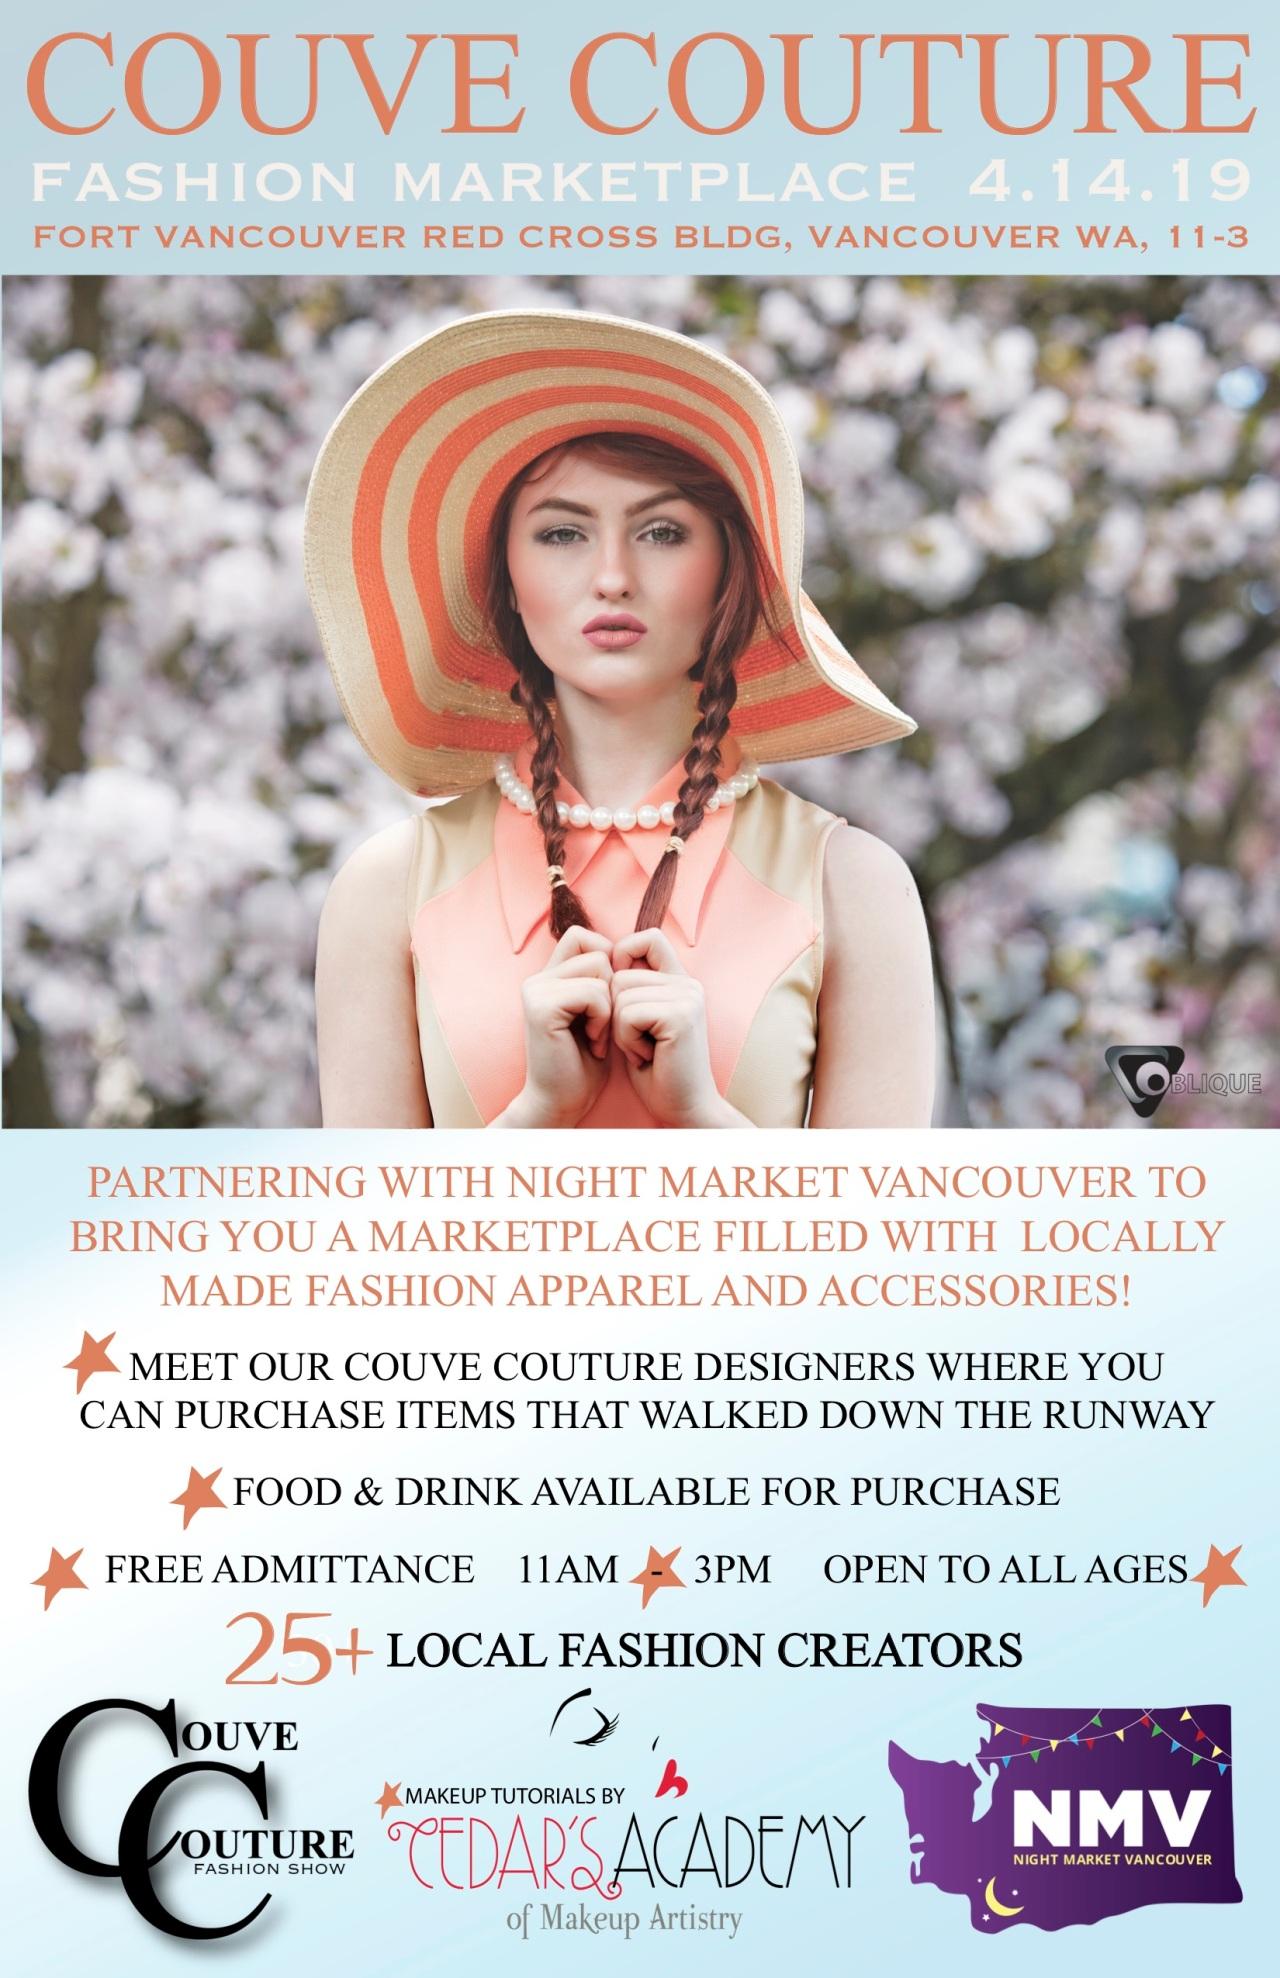 CC Fashion Marketplace poster copy